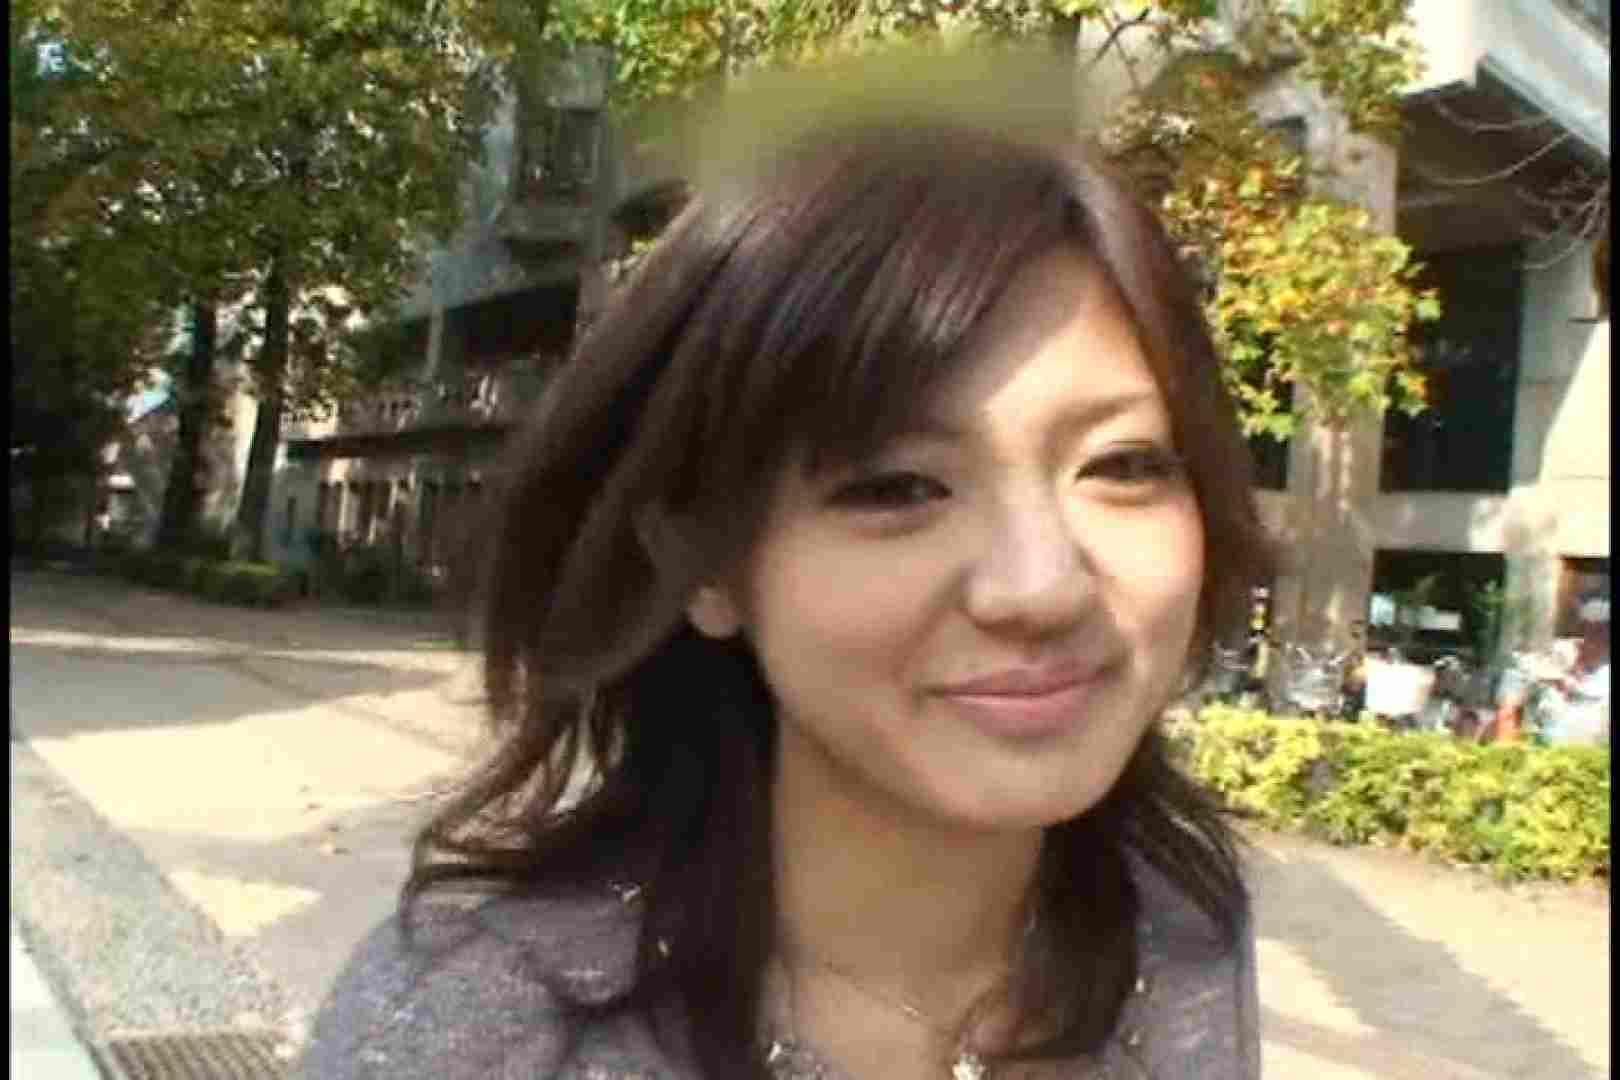 JDハンター全国ツアー vol.035 前編 女子大生のエロ動画 | 0  110PIX 3